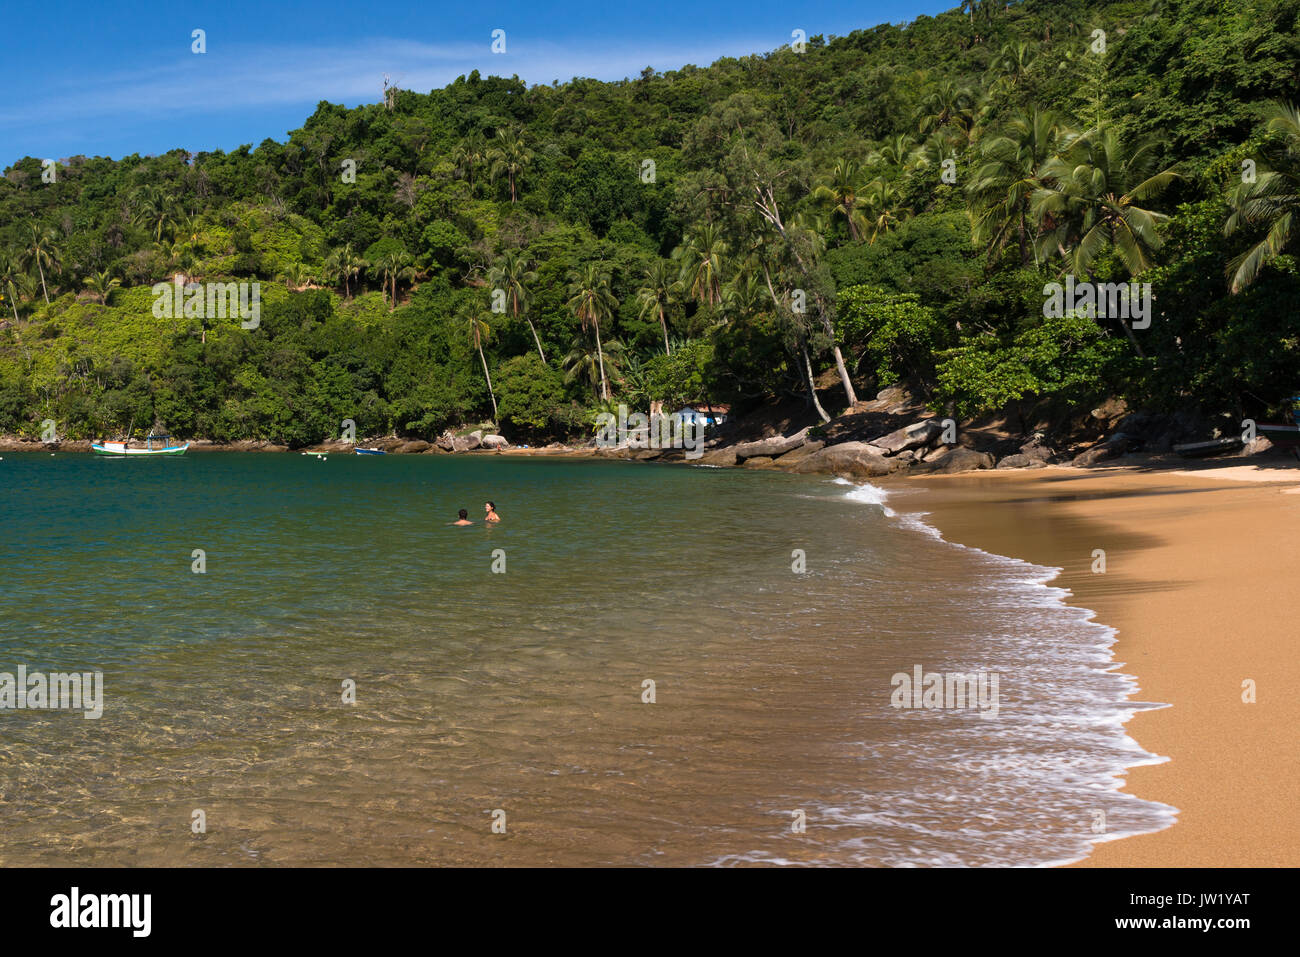 Beach in Ilhabela, Brazil Stock Photo